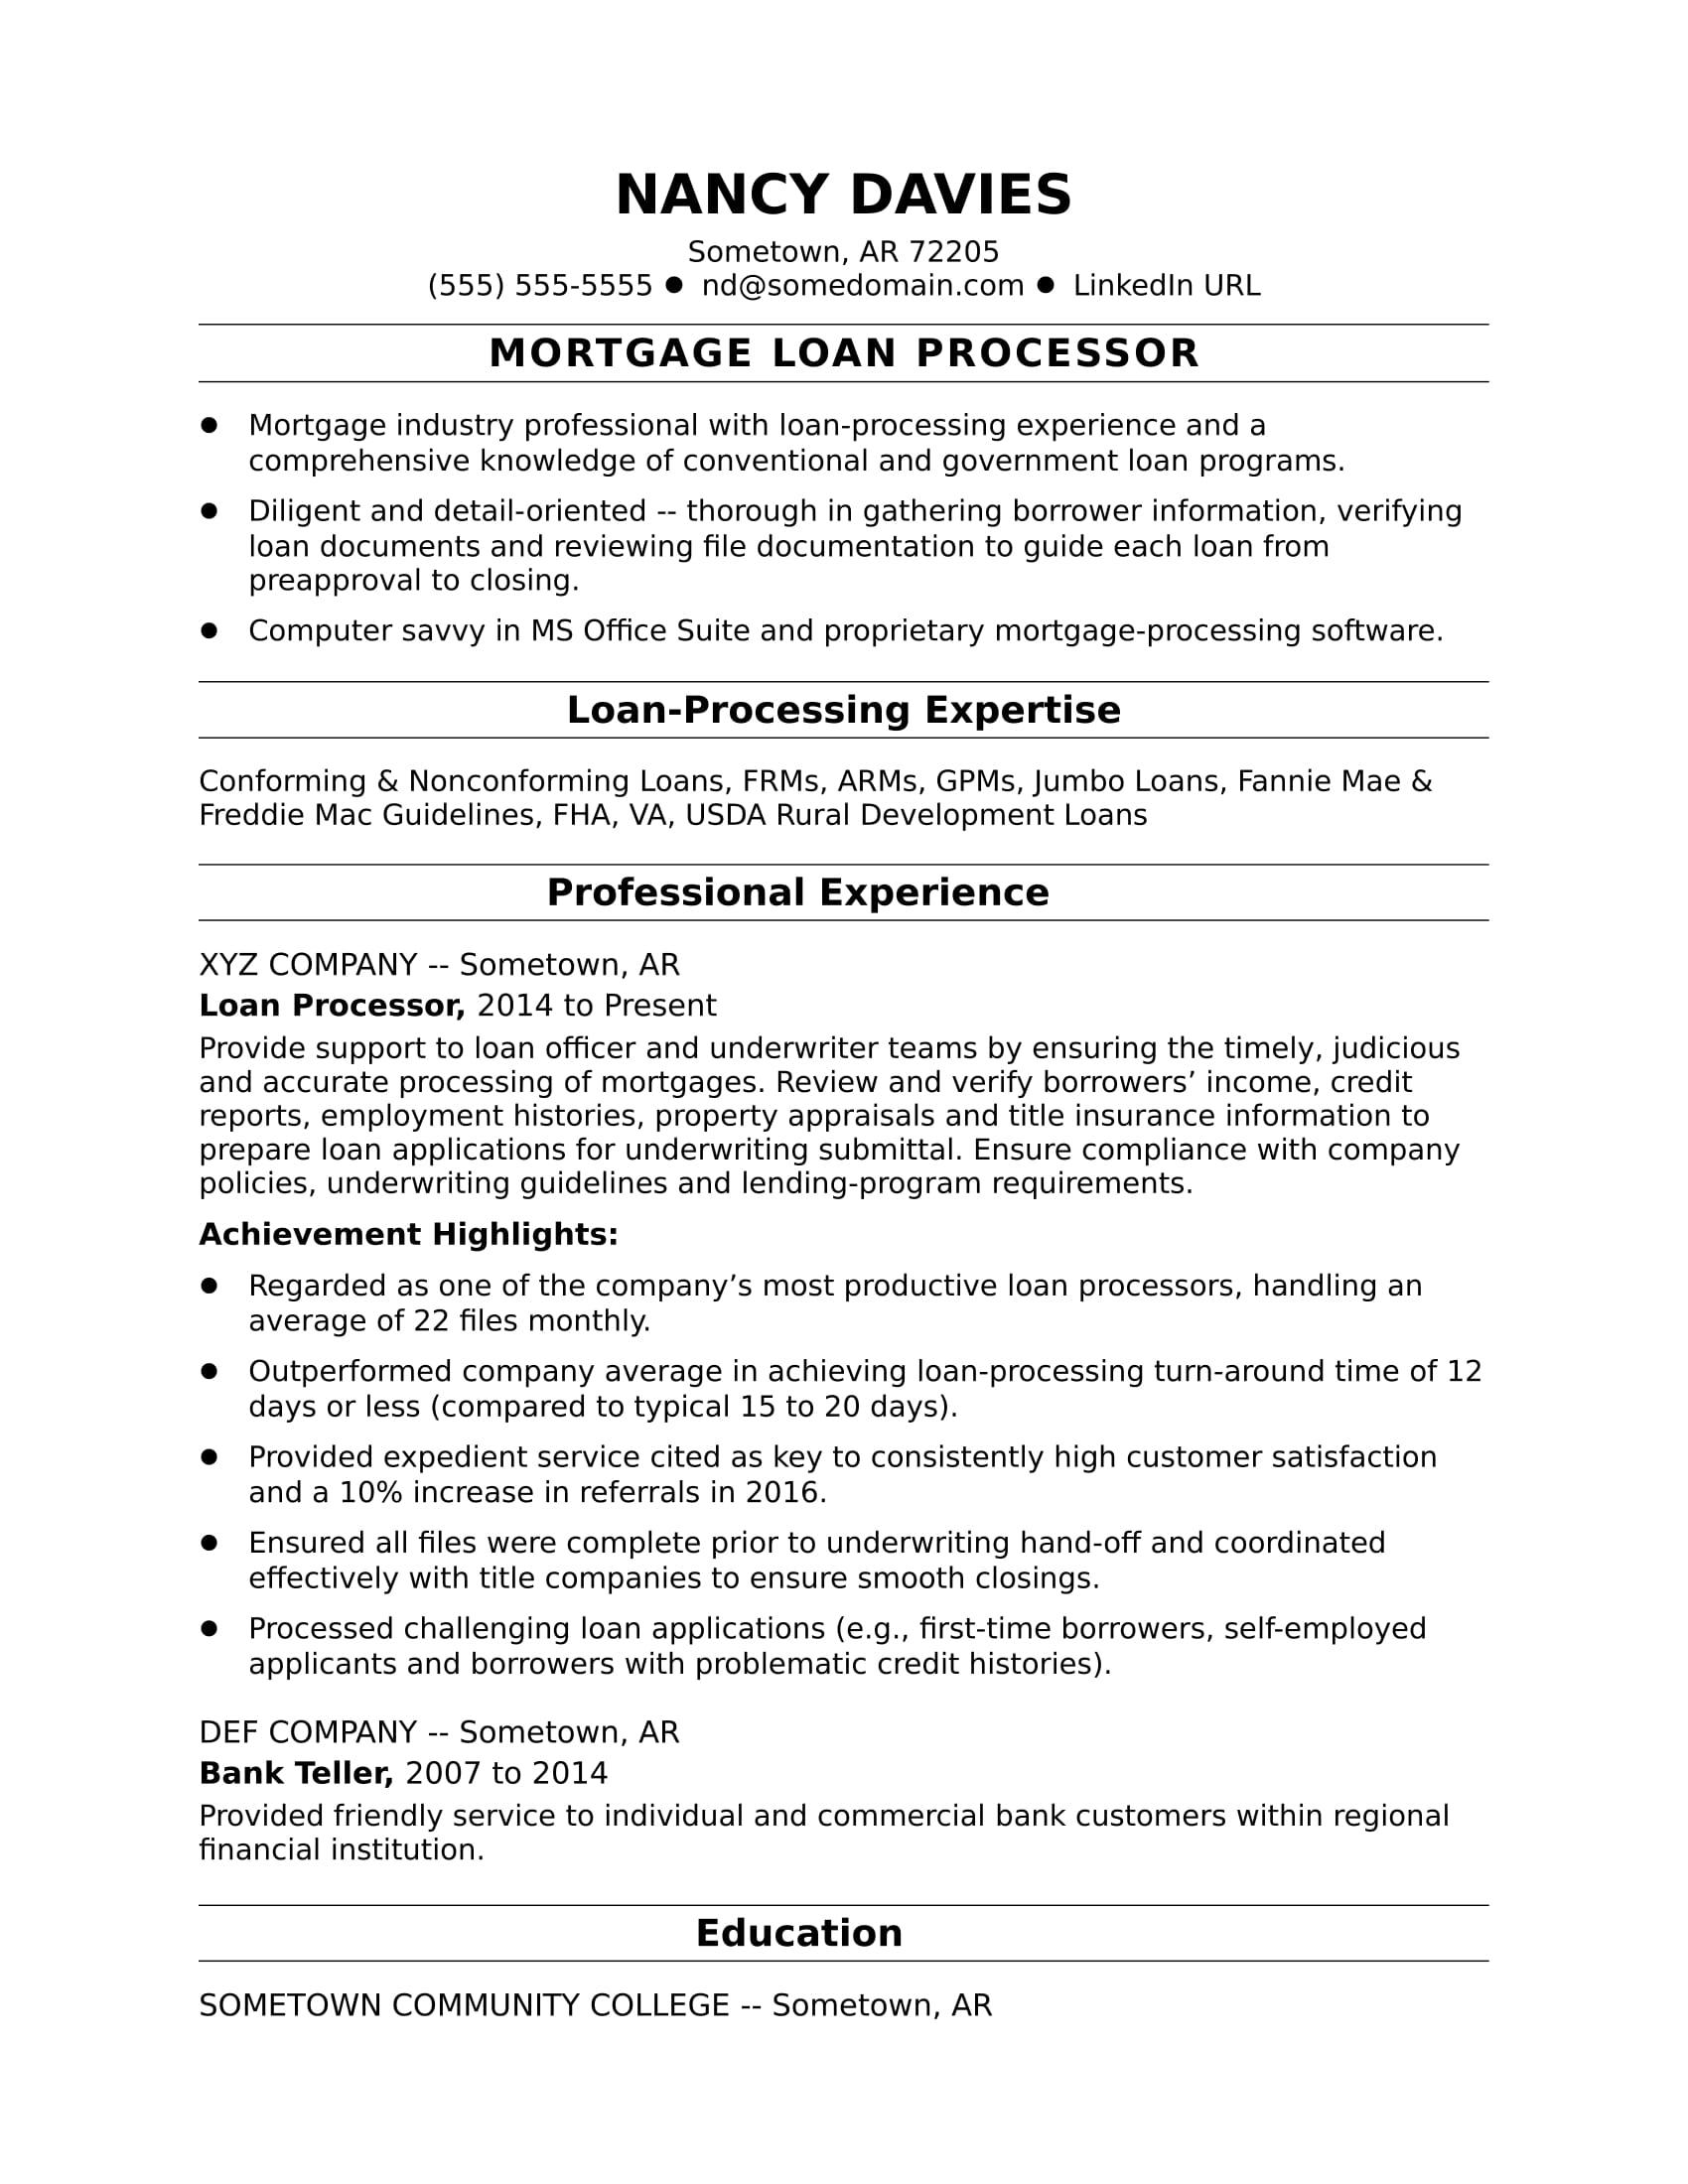 example of loan processor resume